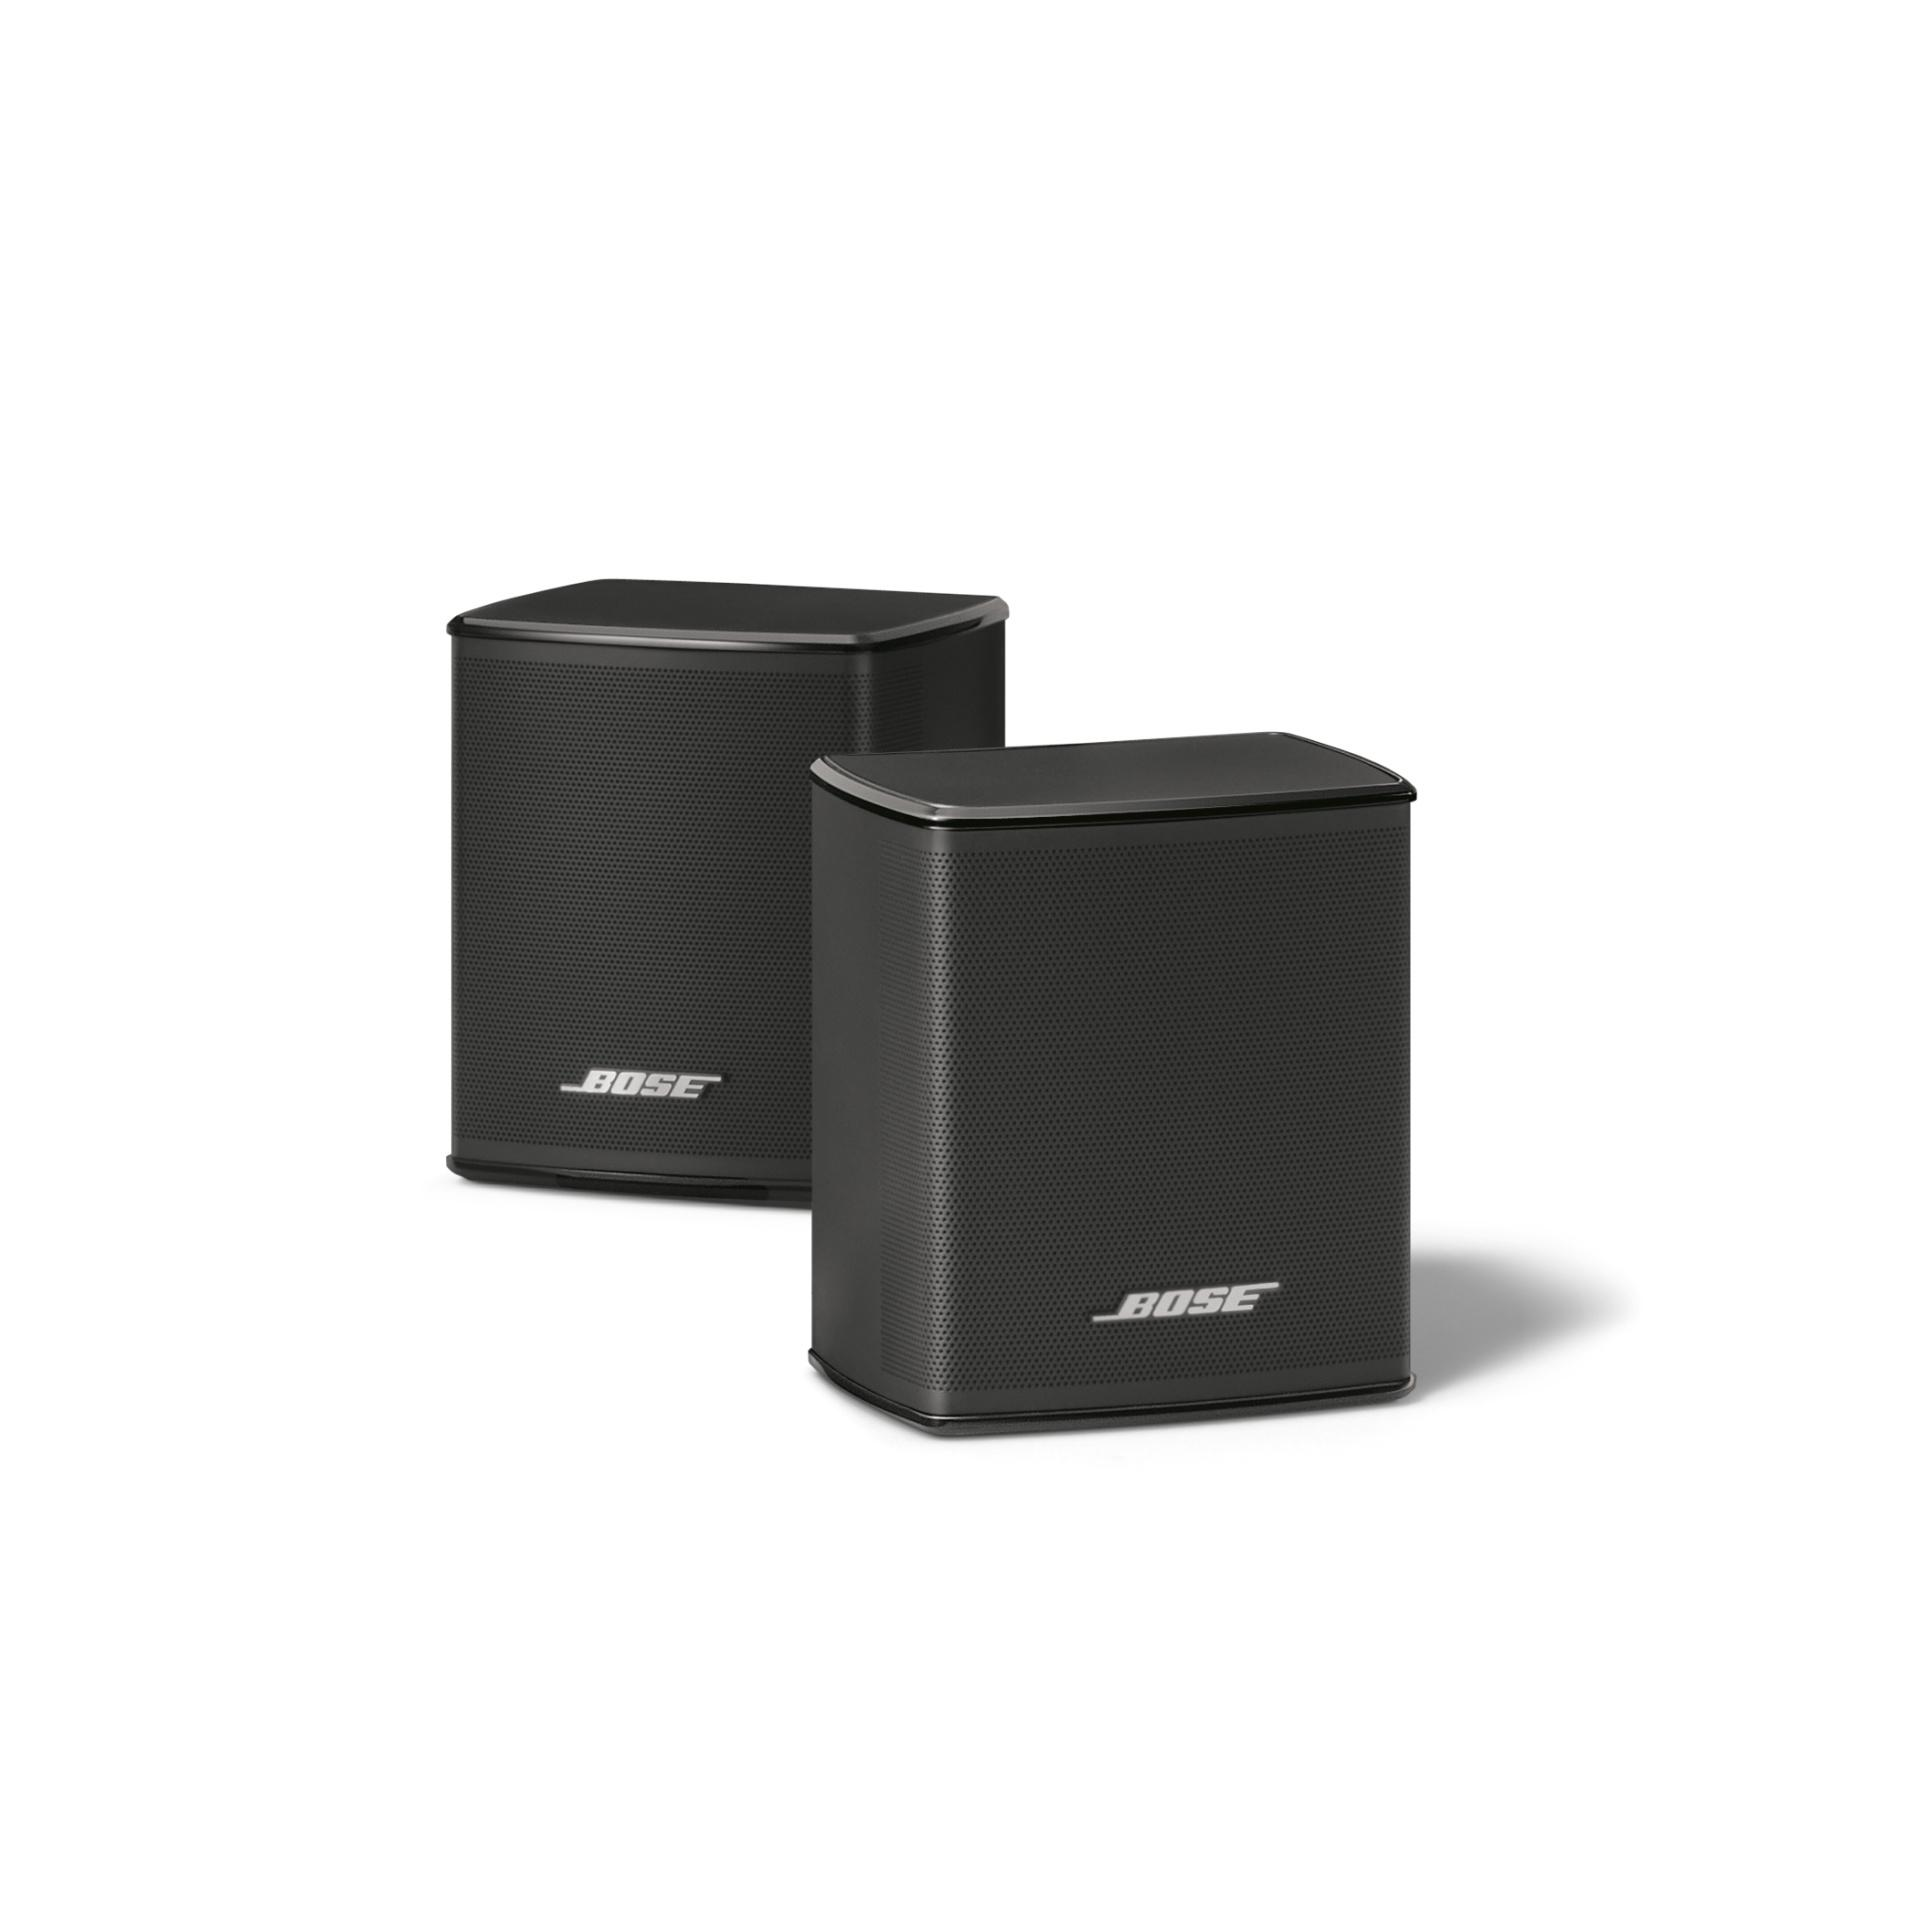 Bose Philippines: Bose price list - Speaker , Headphone